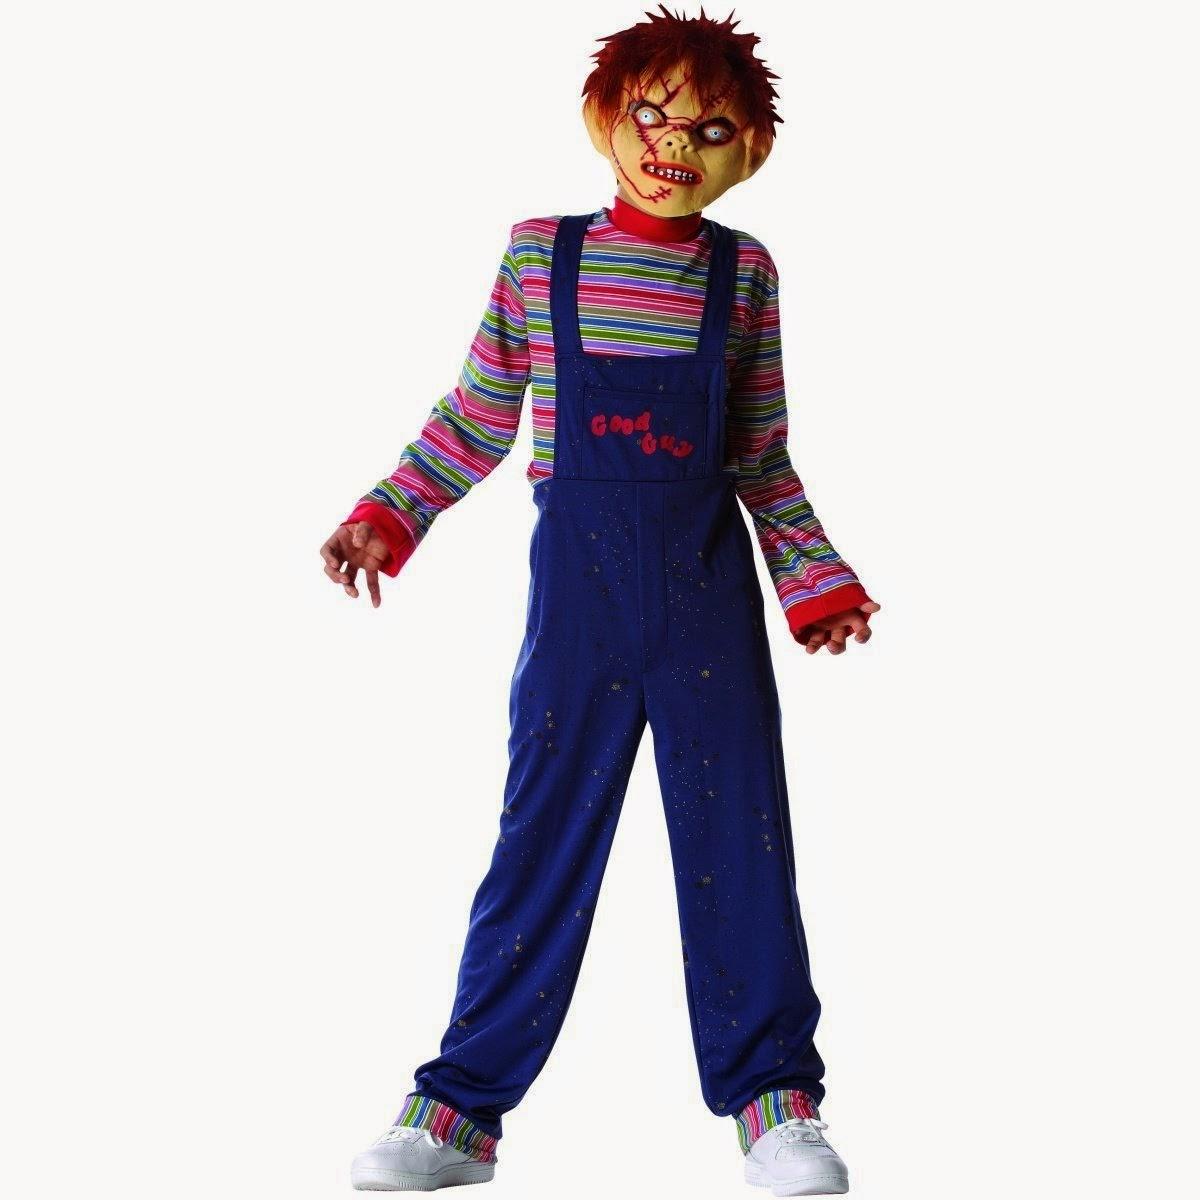 "http://www.amazon.com/gp/product/B001I04SLI/ref=as_li_tl?ie=UTF8&camp=1789&creative=390957&creativeASIN=B001I04SLI&linkCode=as2&tag=hubpages0b4de-20&linkId=LGNEMHSRPXM4JNEL"">Kids Chucky Costume</a><img src=""http://ir-na.amazon-adsystem.com/e/ir?t=hubpages0b4de-20&l=as2&o=1&a=B001I04SLI"